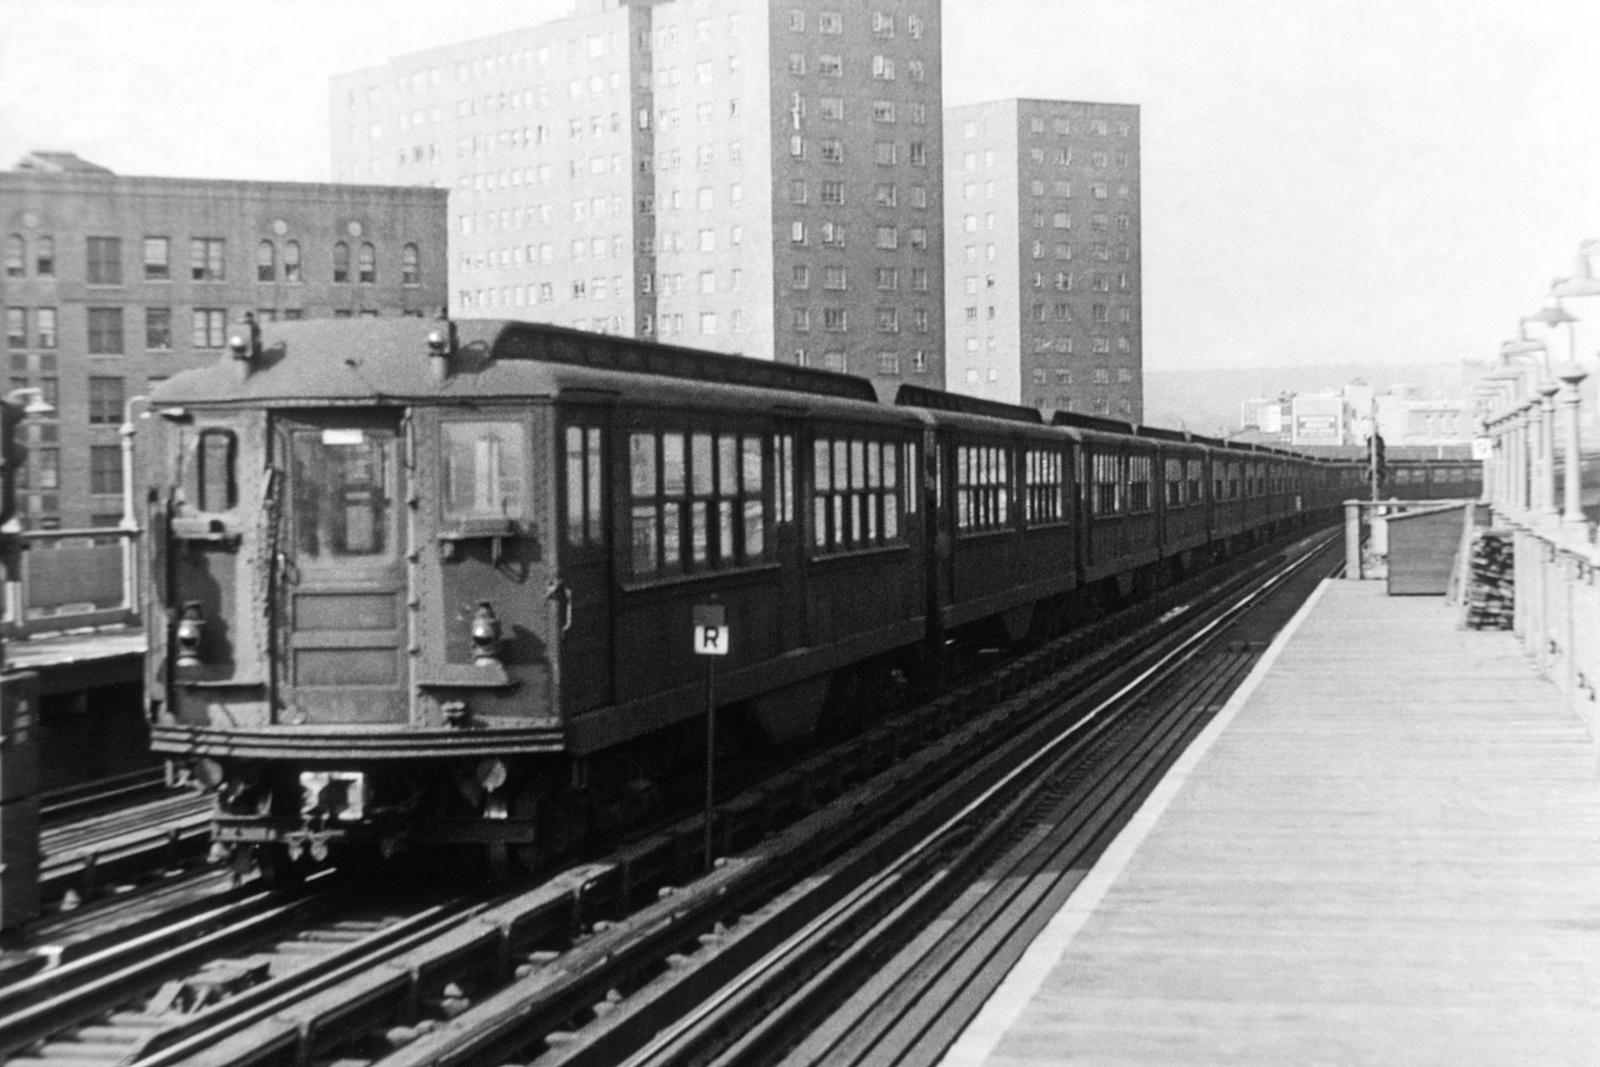 (462k, 1600x1067)<br><b>Country:</b> United States<br><b>City:</b> New York<br><b>System:</b> New York City Transit<br><b>Line:</b> IRT West Side Line<br><b>Location:</b> 225th Street<br><b>Car:</b> Hi-V  <br><b>Collection of:</b> David Pirmann<br><b>Viewed (this week/total):</b> 3 / 5304